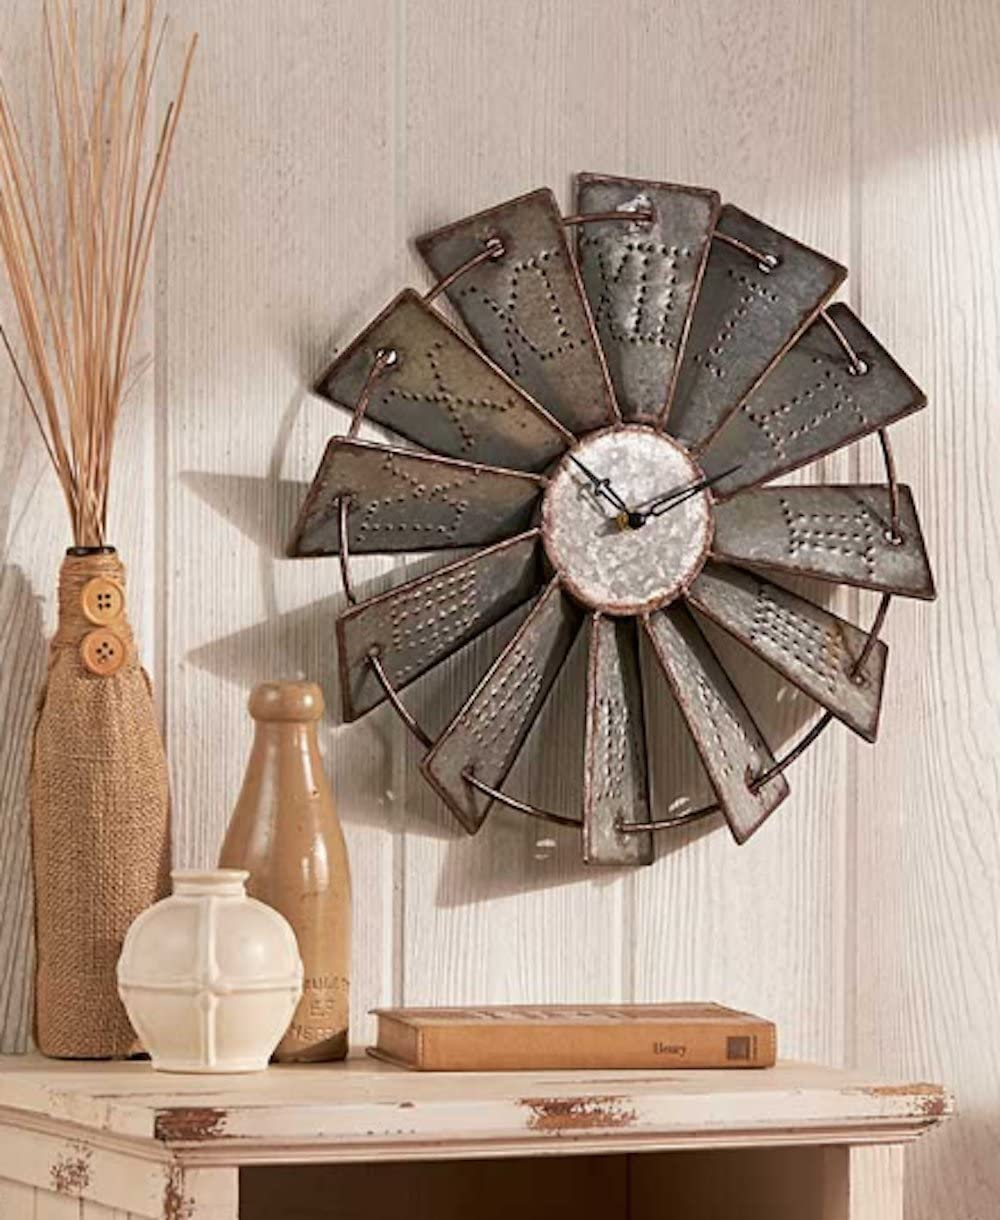 Amazon Com Homecricket Country Decor Metal Windmill Rustic Country Primitive Roman Numerals Wall Clock Home Kitchen